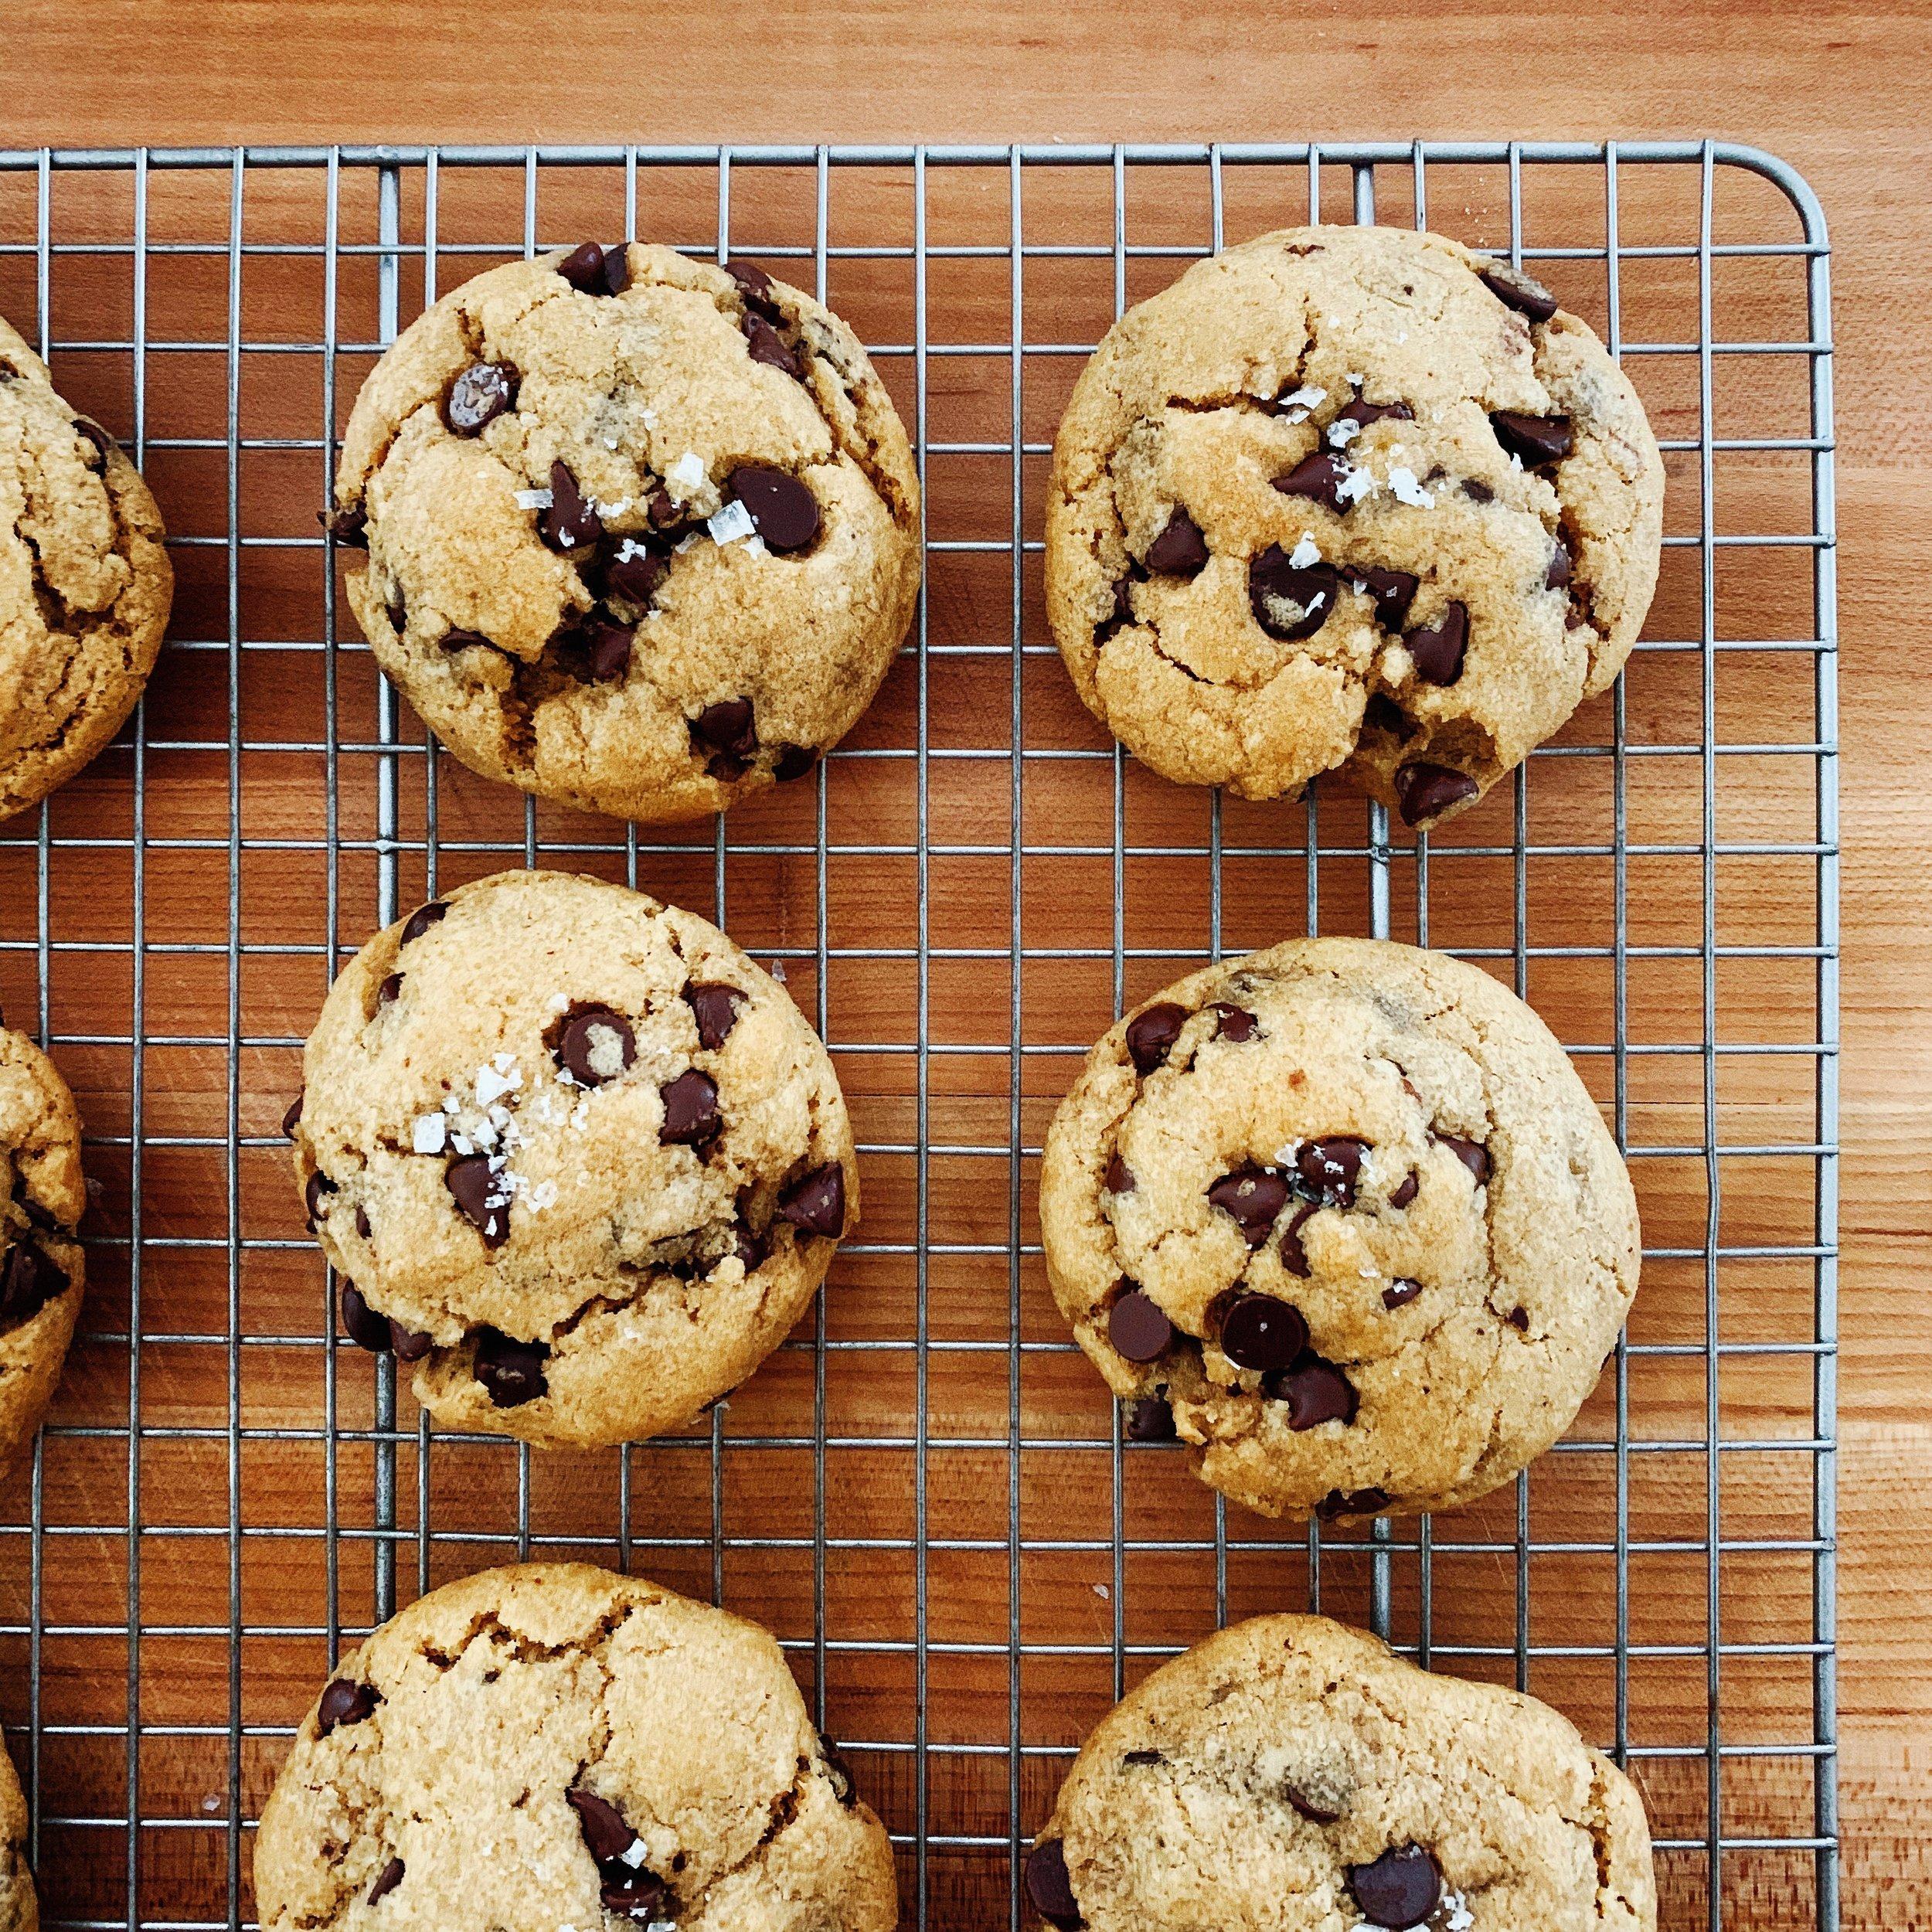 The Secretly Vegan Chocolate Chip Cookies